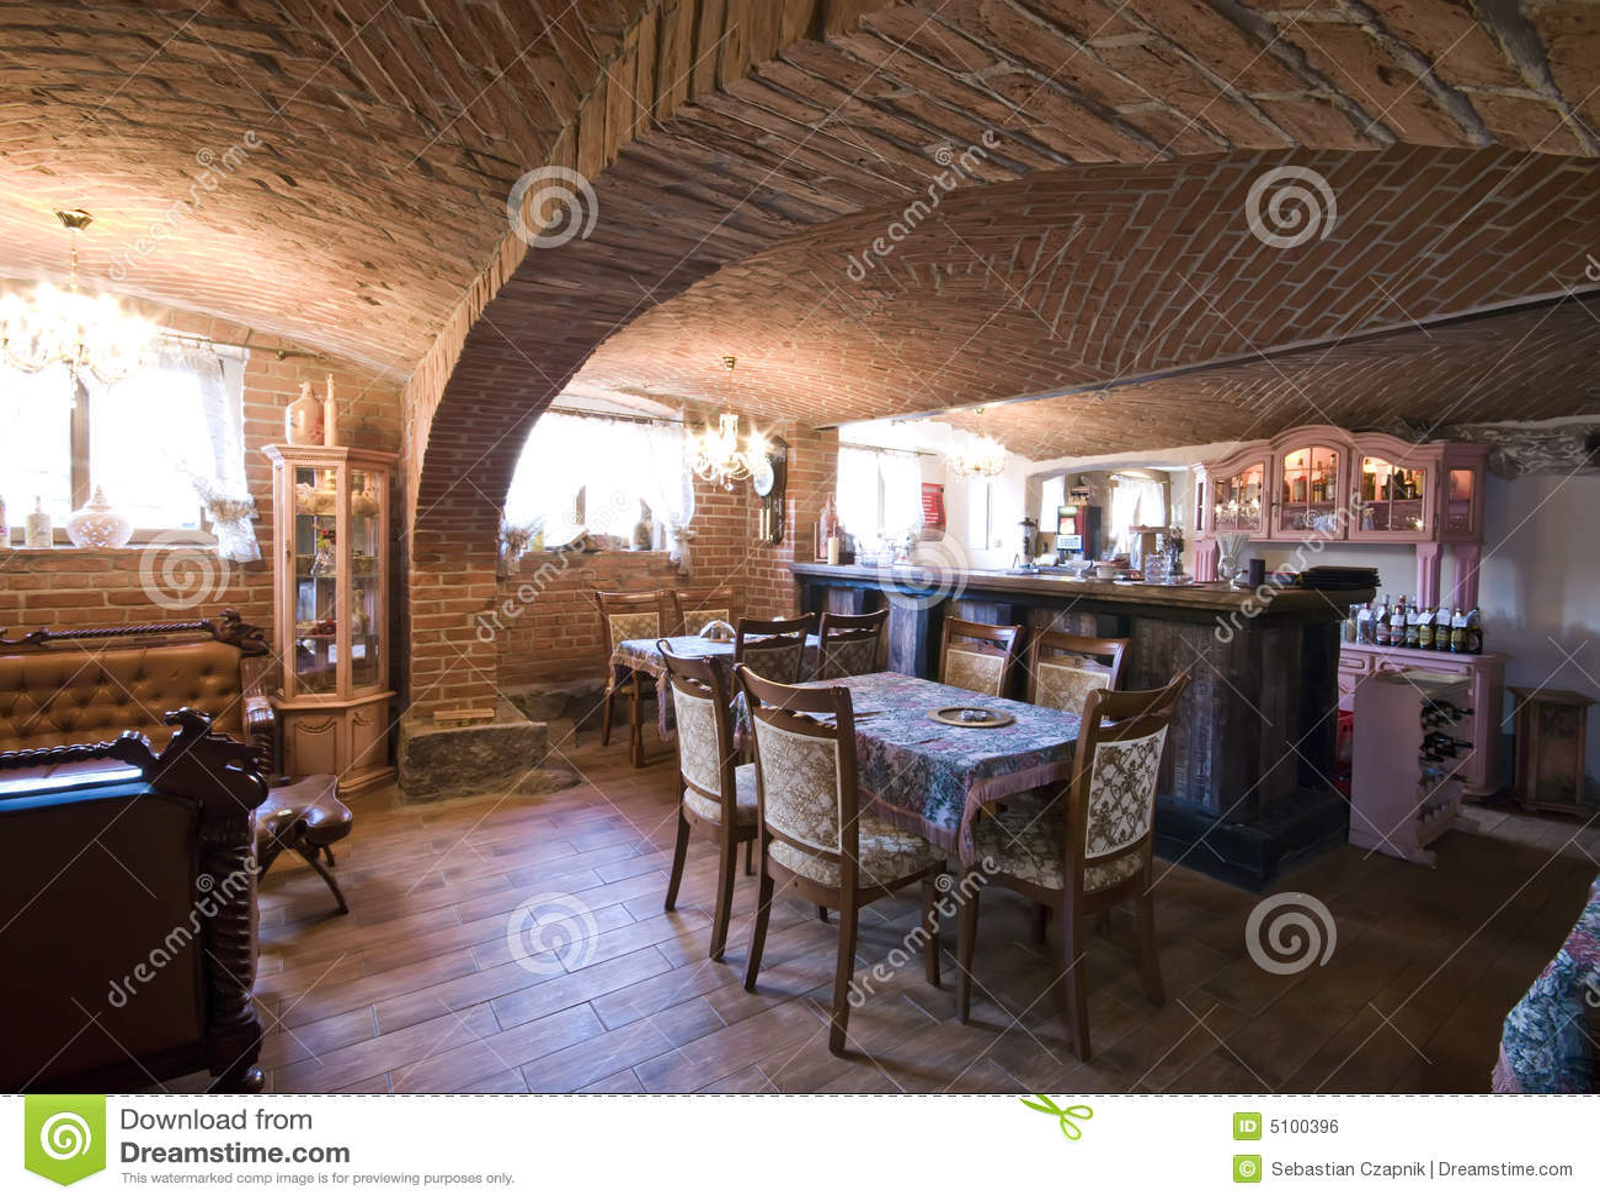 Restaurant In Brick Basement Royalty Free Stock Image